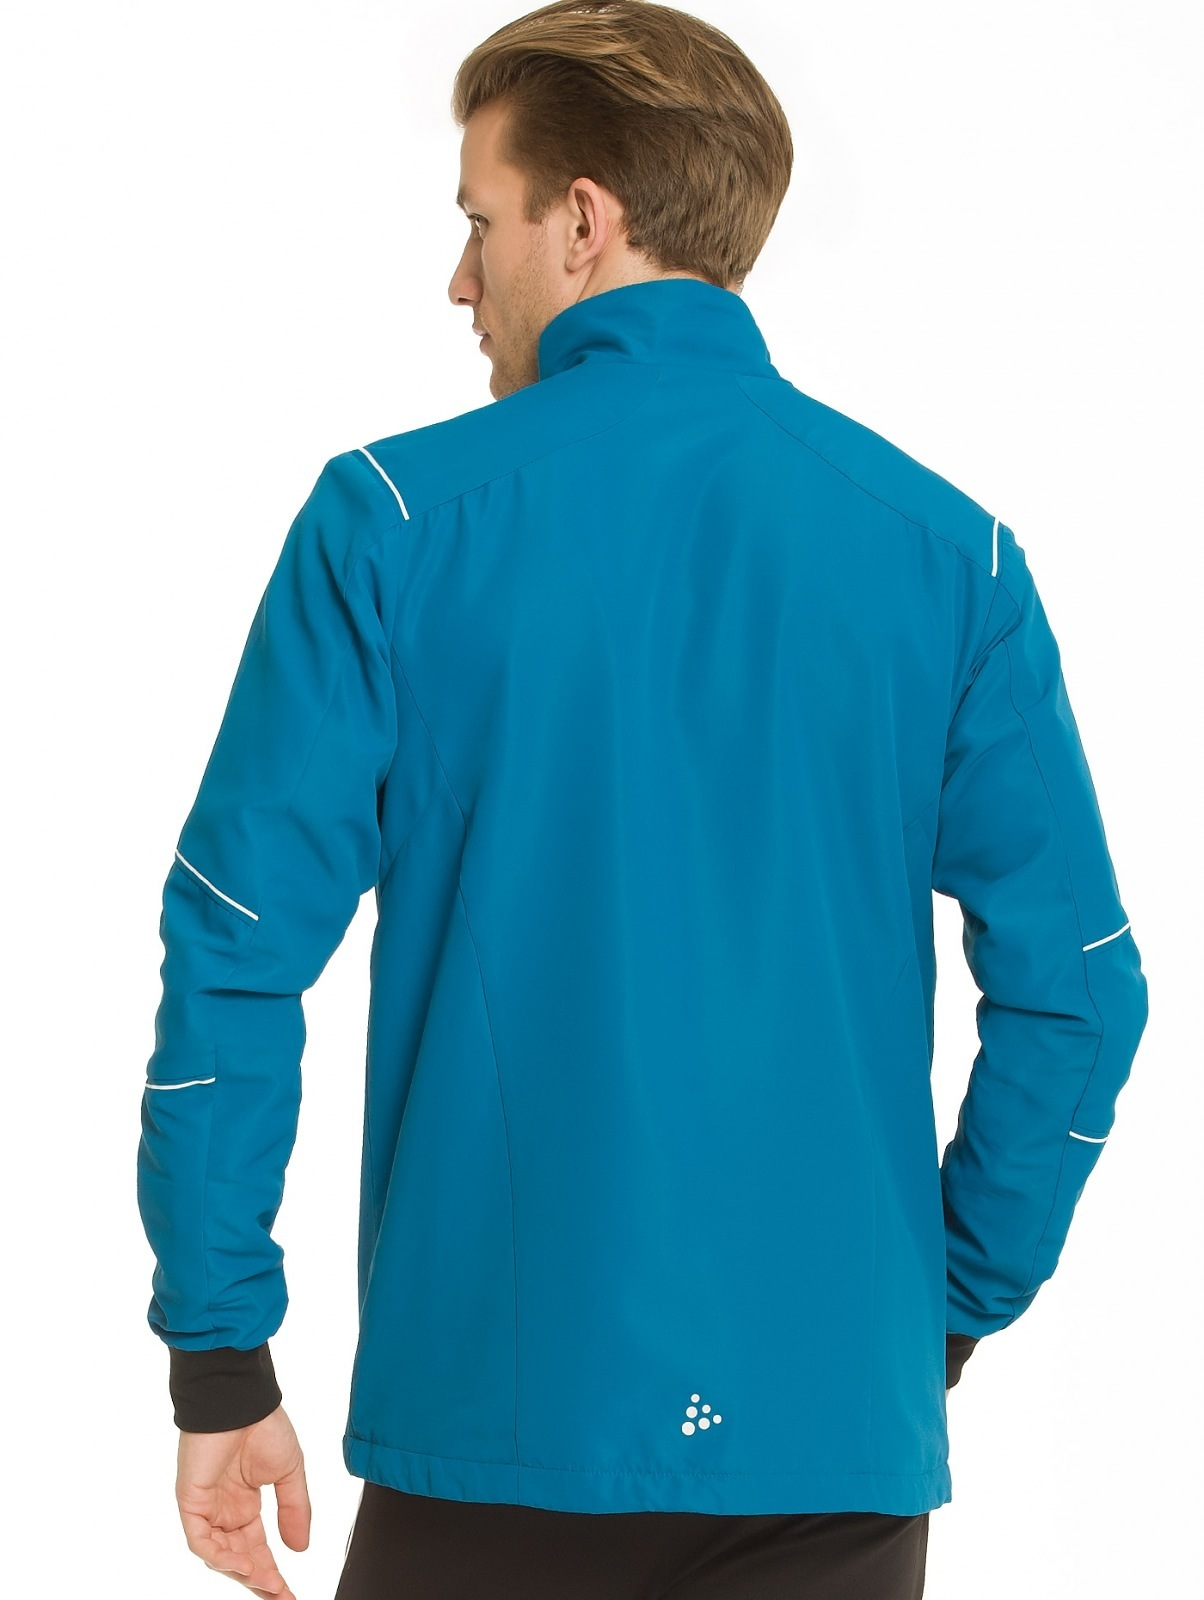 Мужская лыжная куртка Craft AXC Touring (1902833-2350)